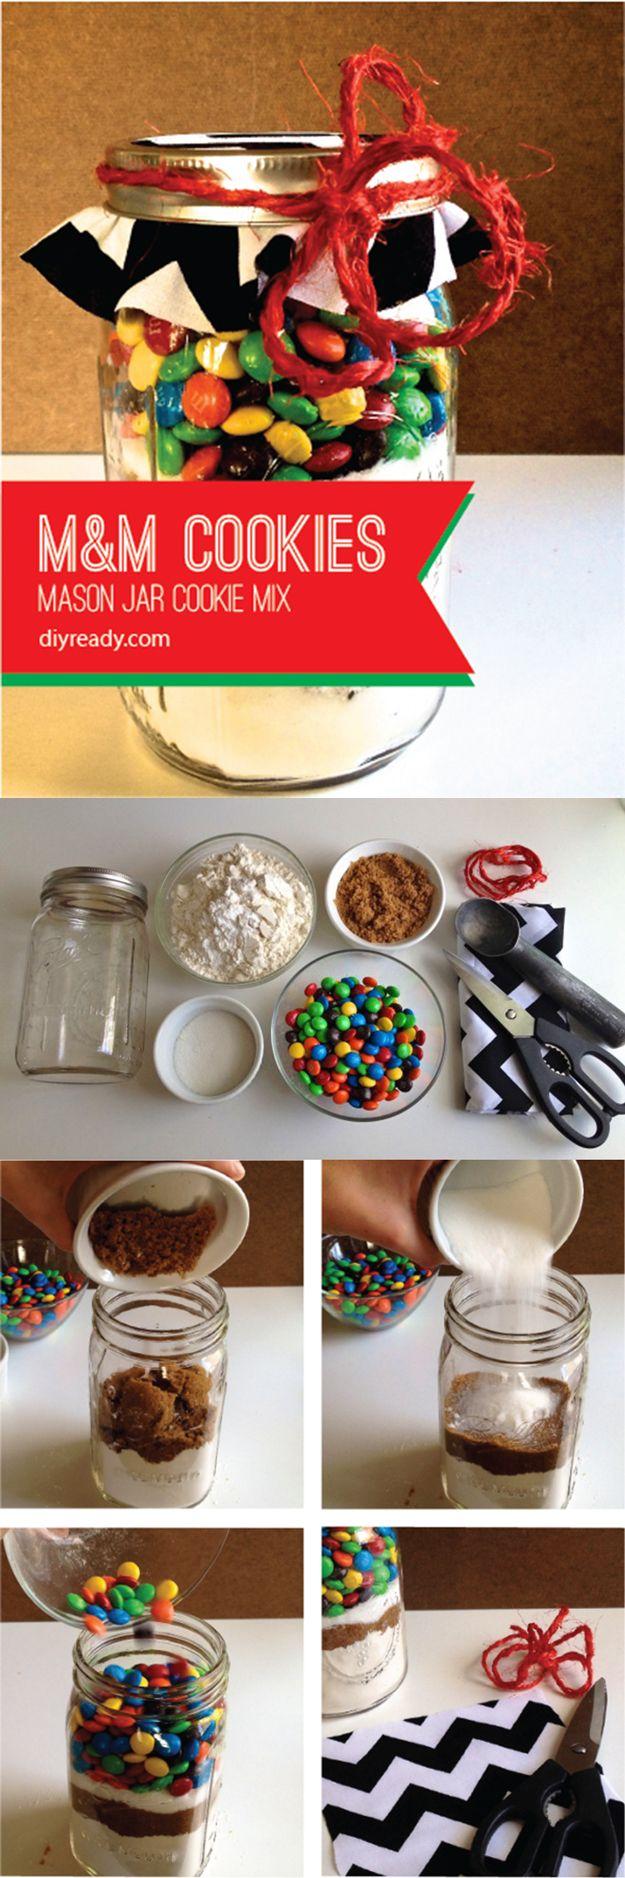 Mason Jar Cookie M&M Cookie Recipe | Easy Mason Jar Cookies by DIY Ready at  http://diyready.com/mason-jar-crafts-in-15-minutes/